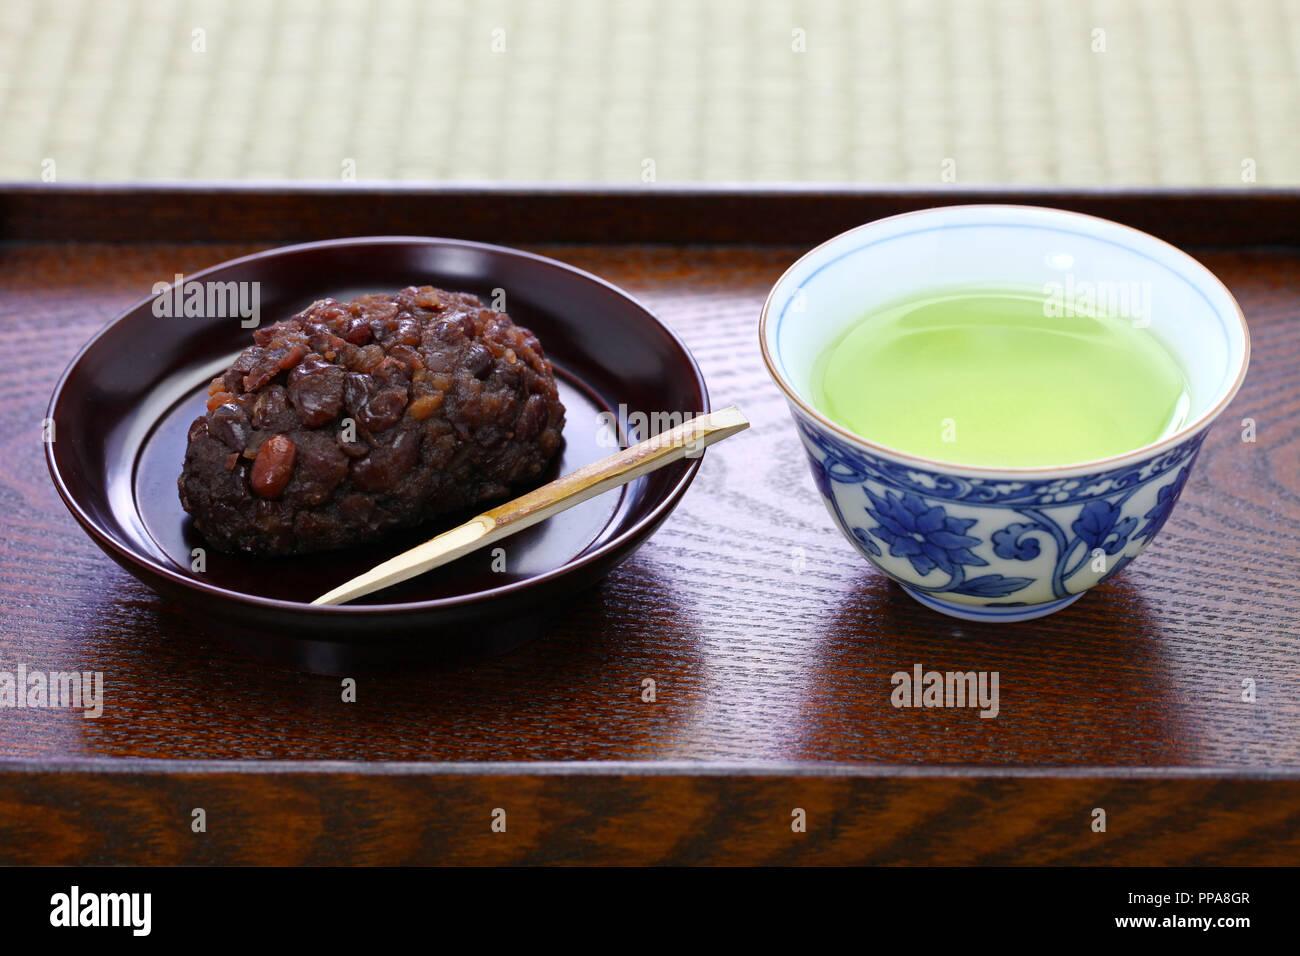 ohagi ( botamochi ), rice cake covered with sweet red bean